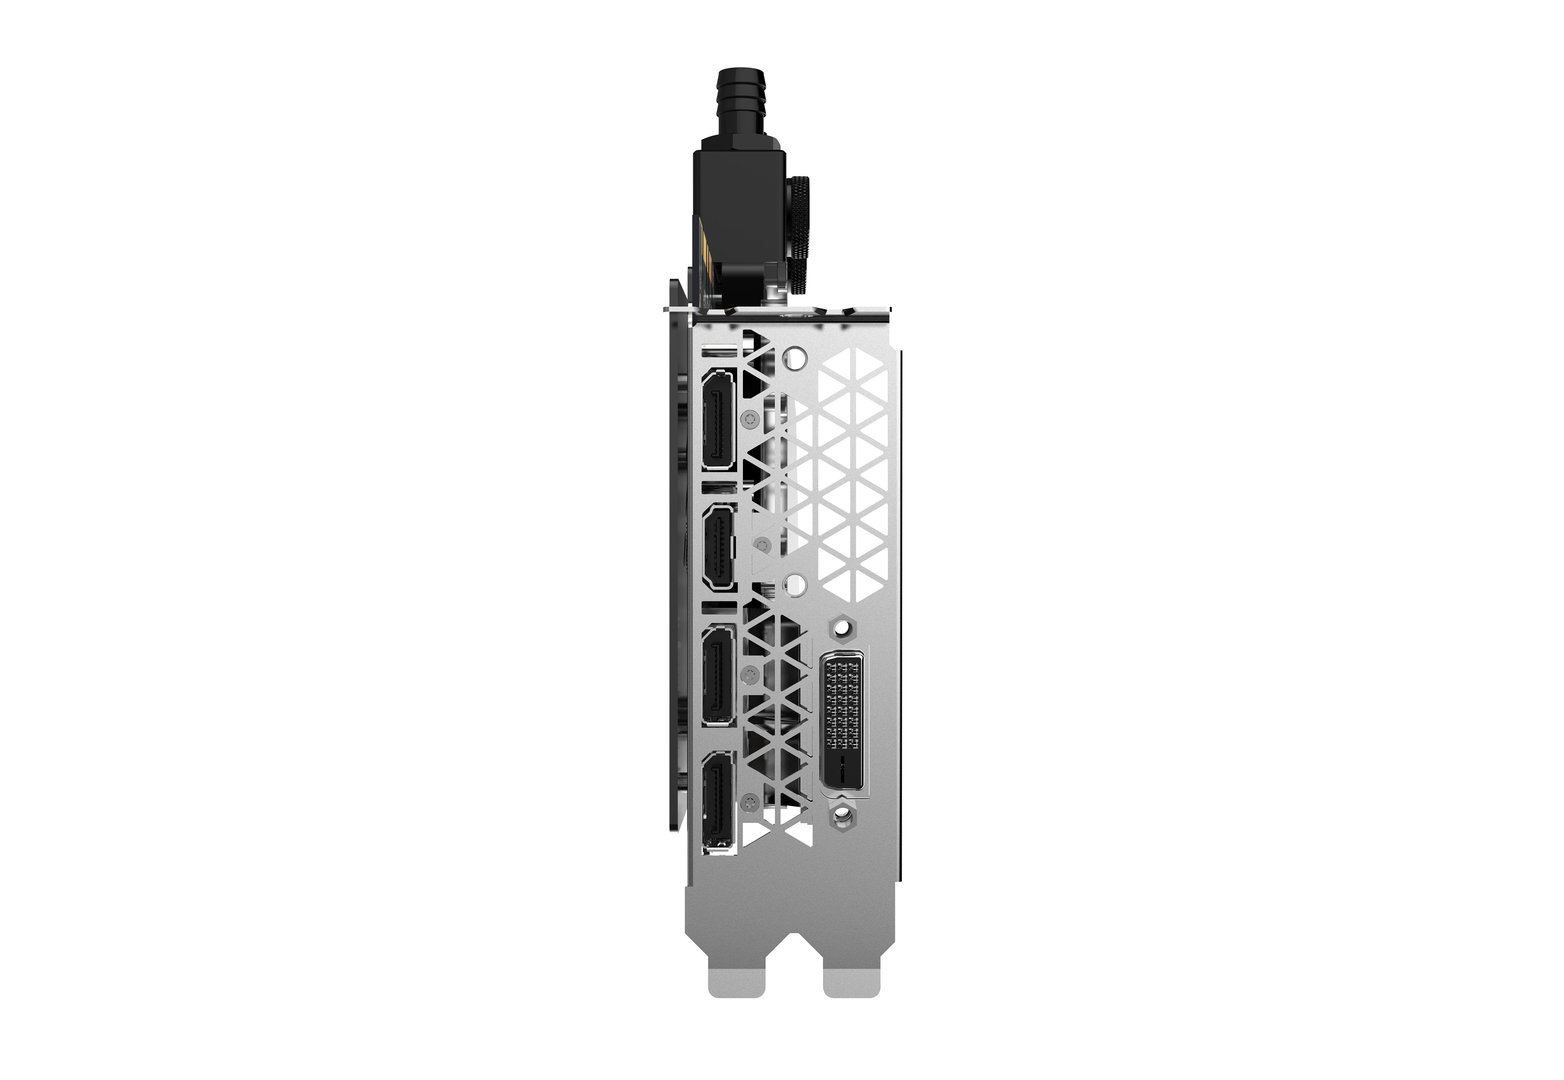 GTX 1080 Ti ArcticStorm Mini